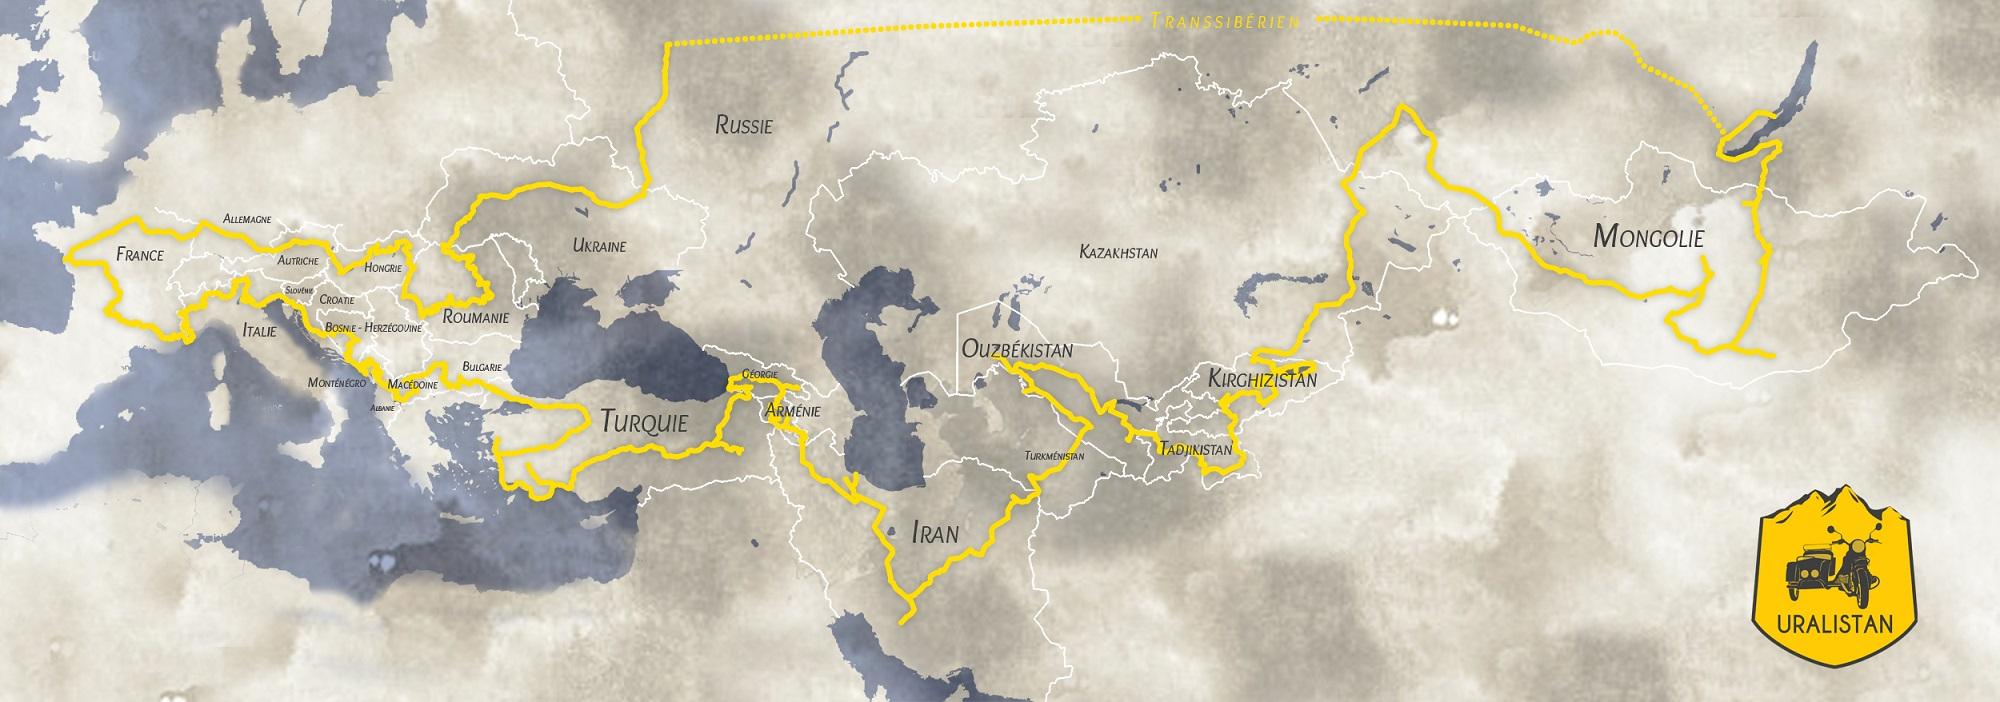 Uralistan - itinéraire road trip